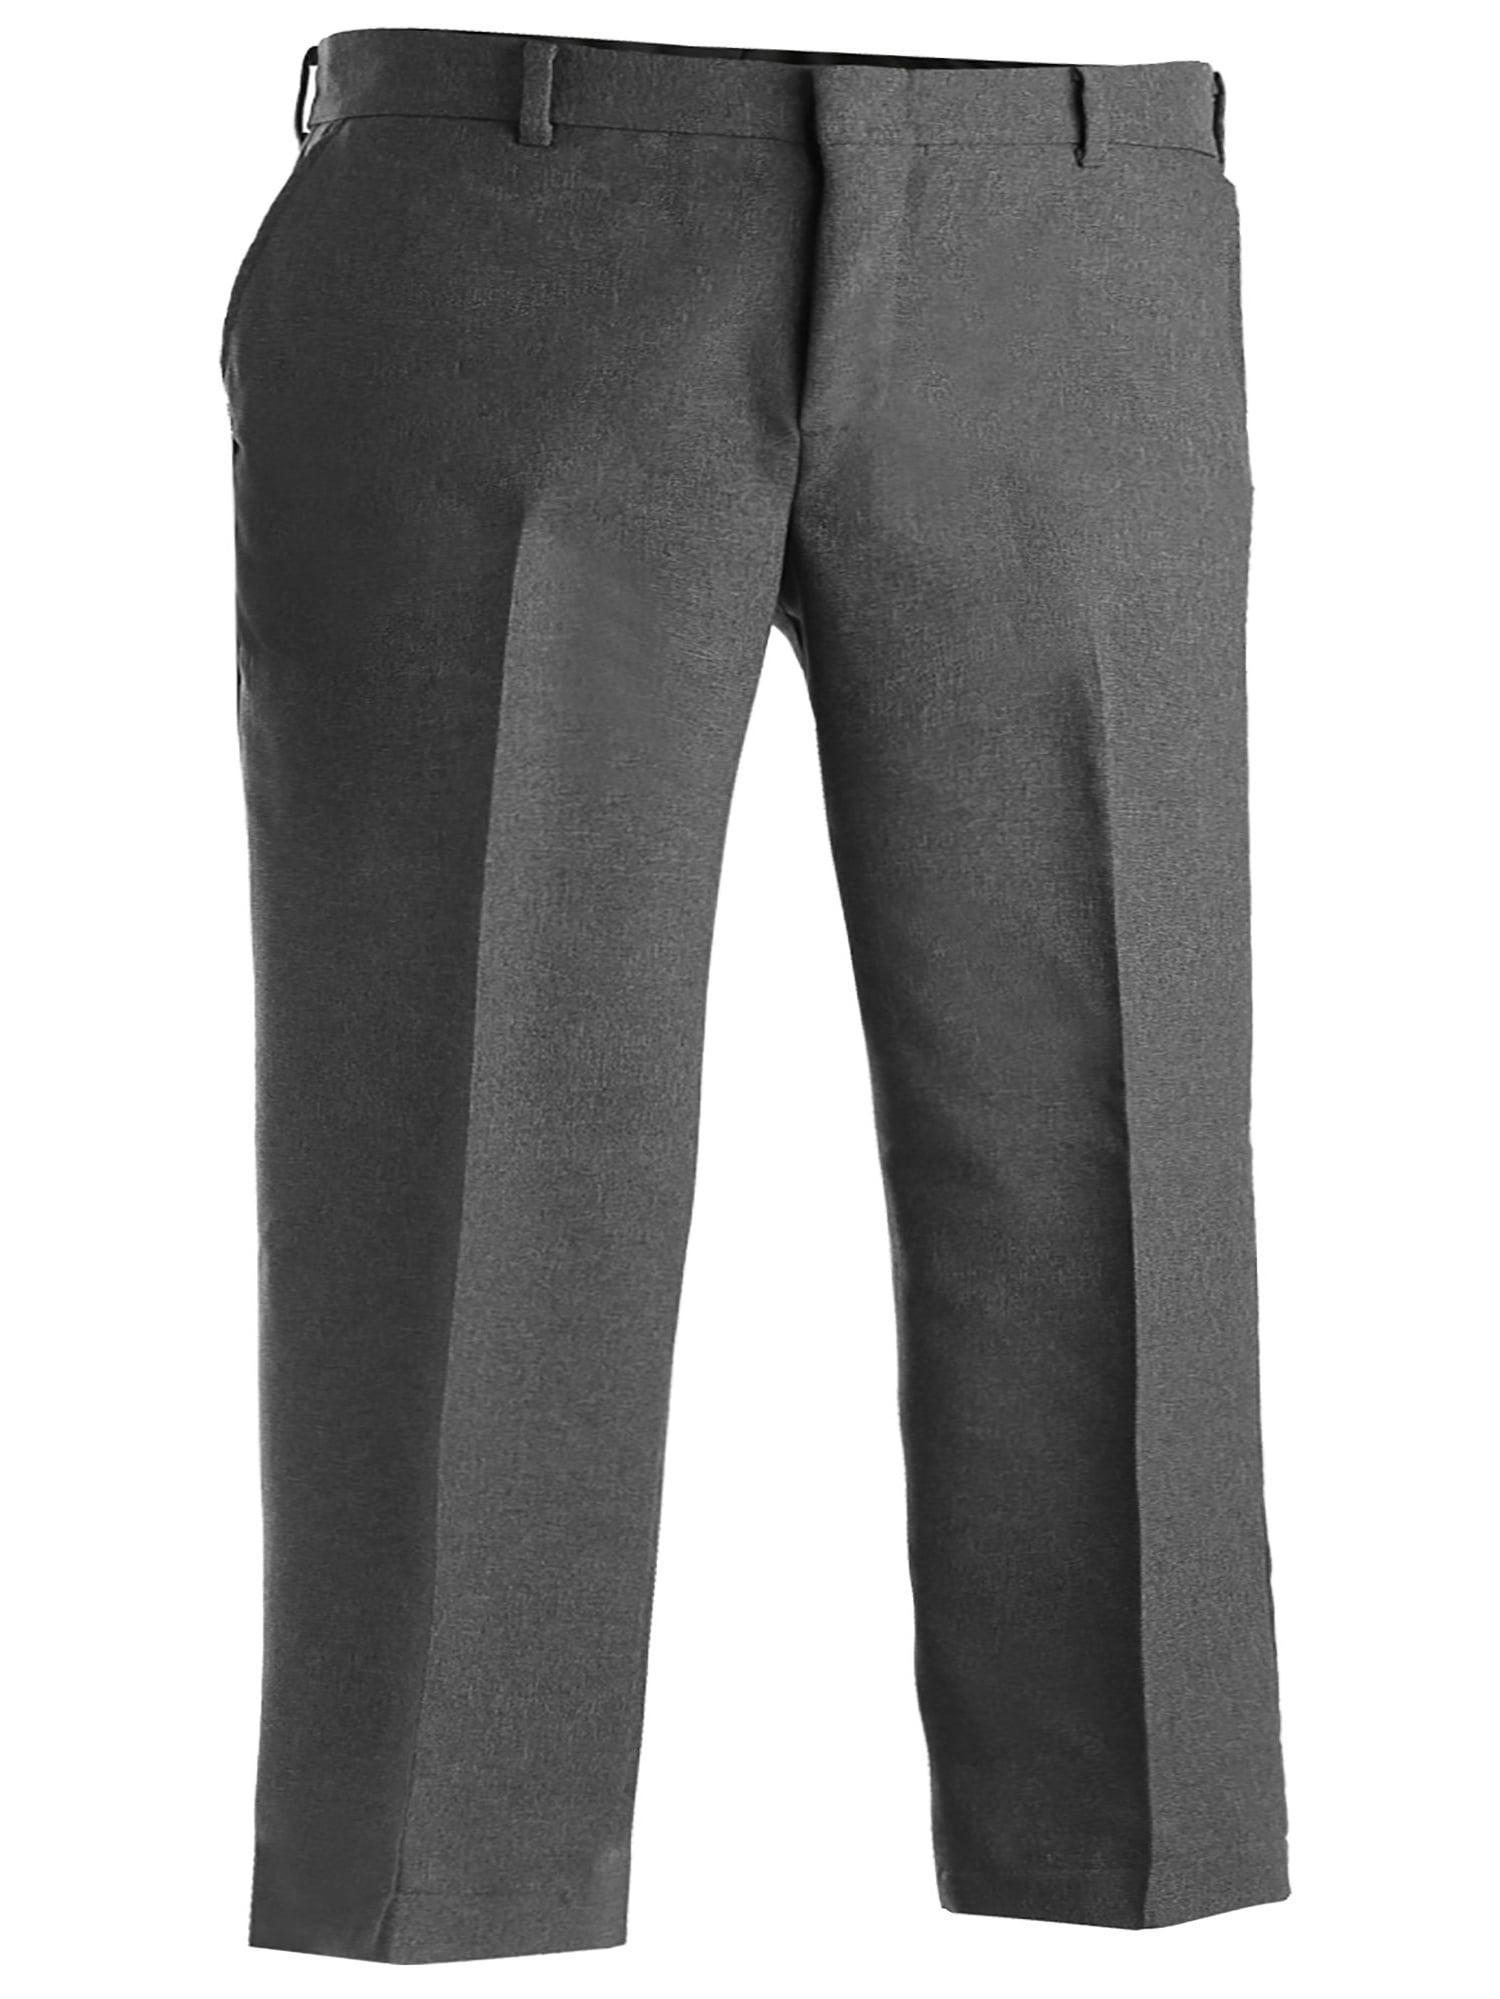 Edwards Garment Men's Flat Front Wrinkle Resistant Dress Pant, Style 2290